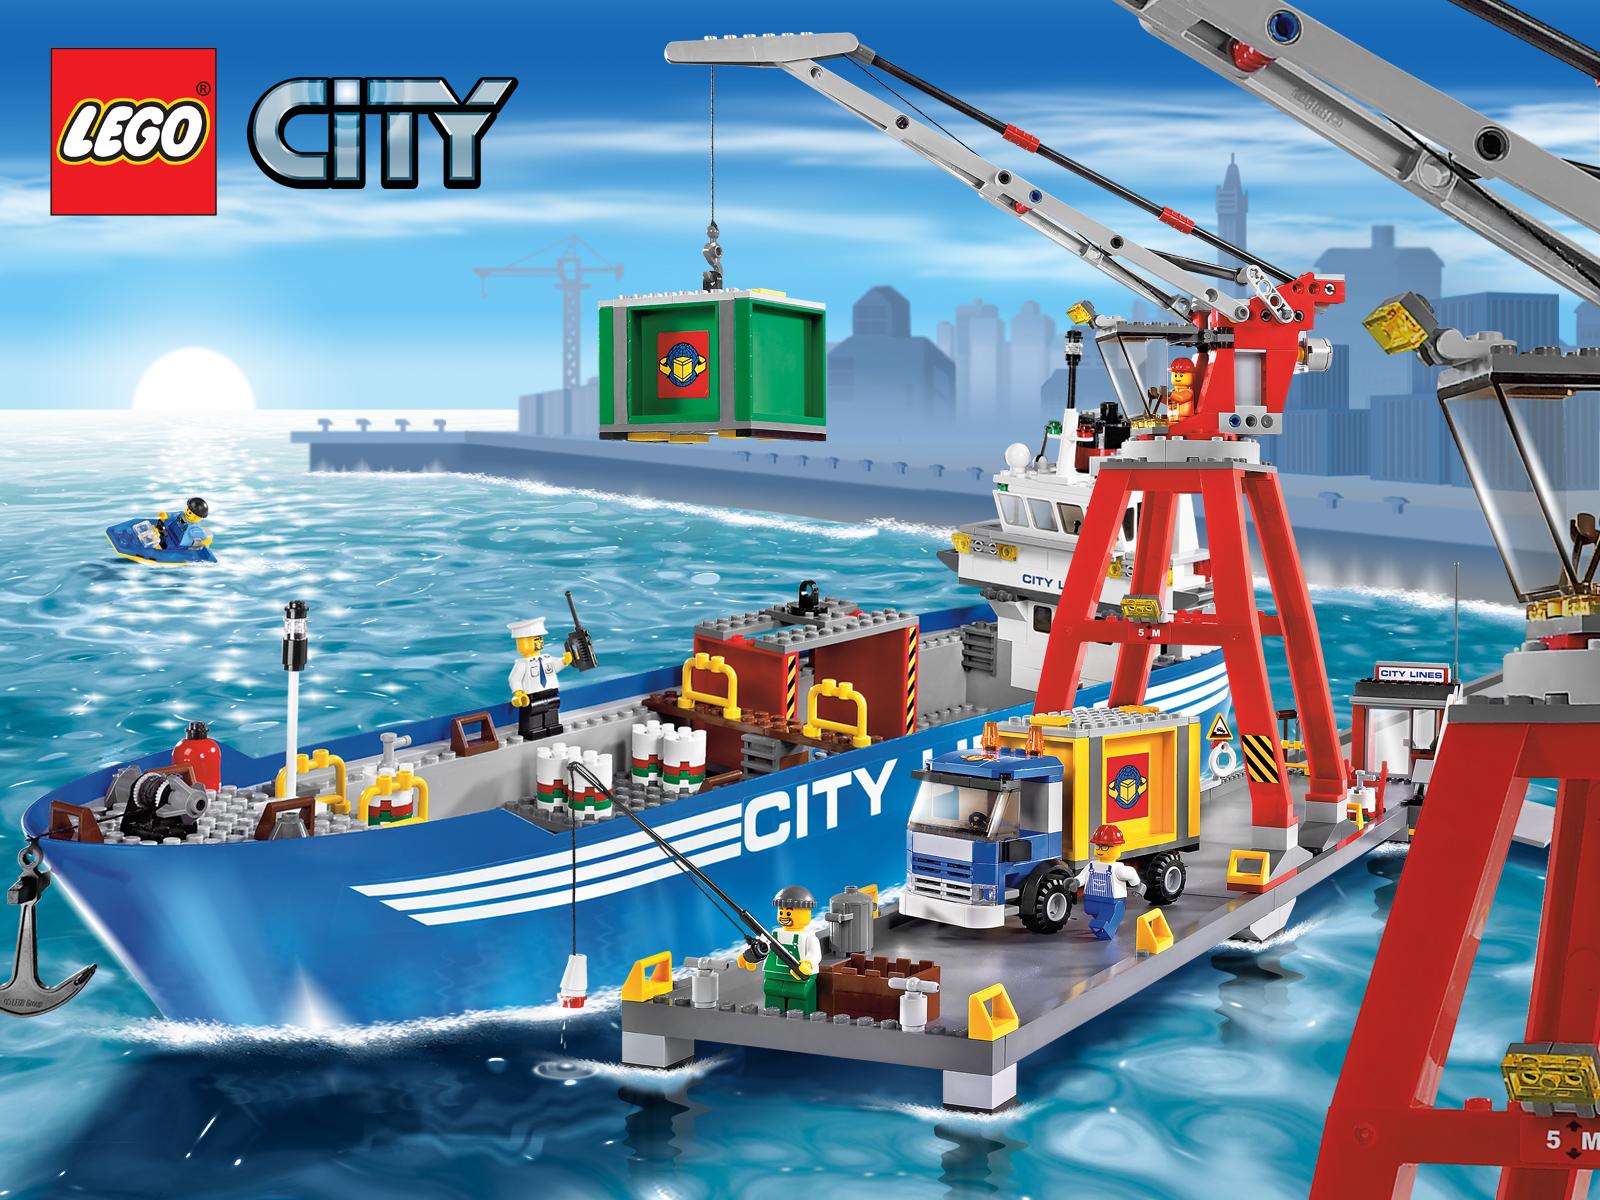 47+ LEGO City Wallpaper on WallpaperSafari